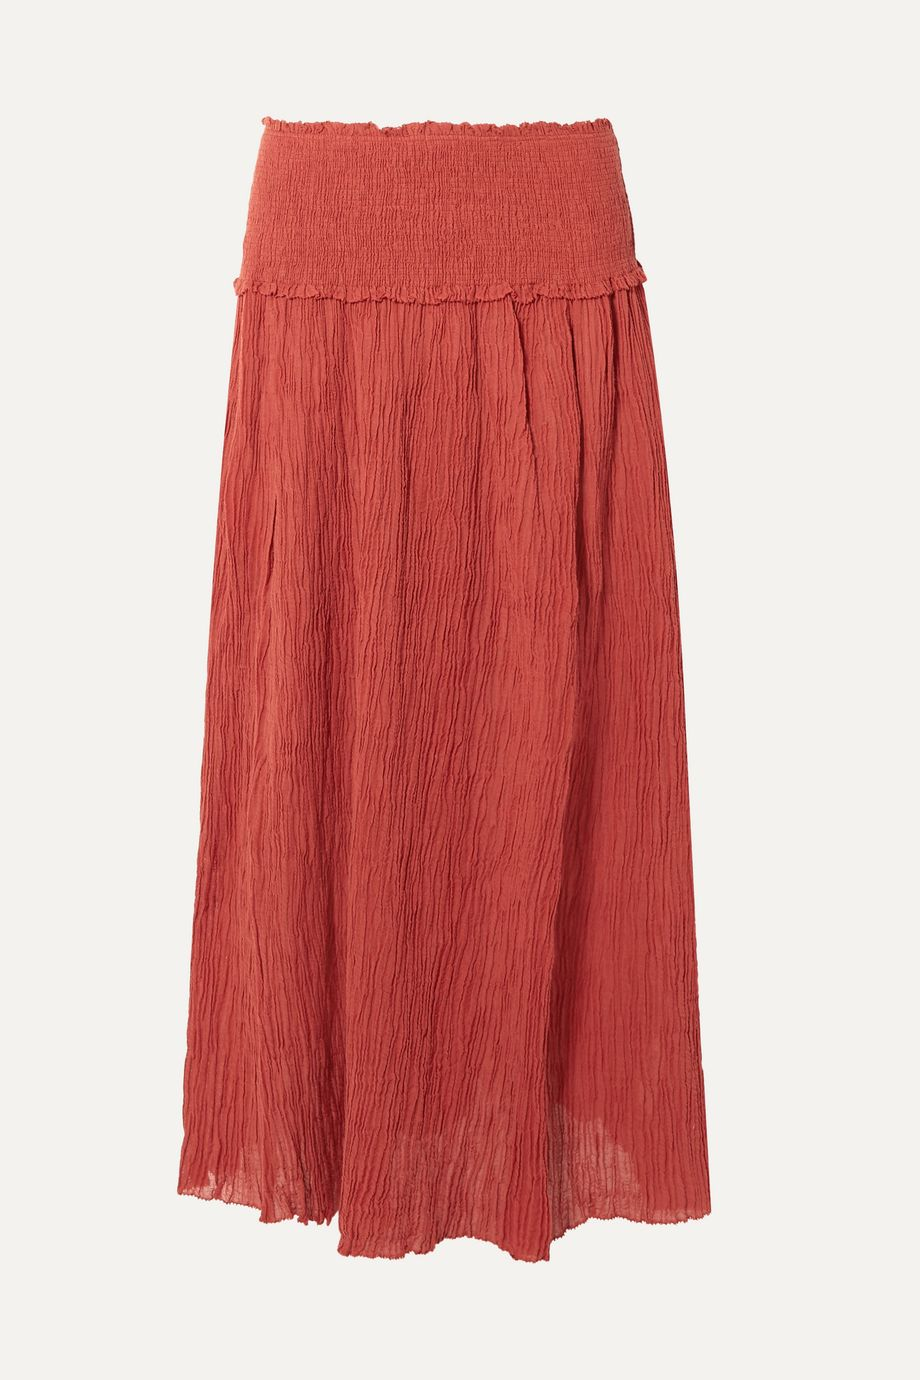 Zimmermann Veneto shirred crinkled ramie and cotton-blend gauze maxi skirt